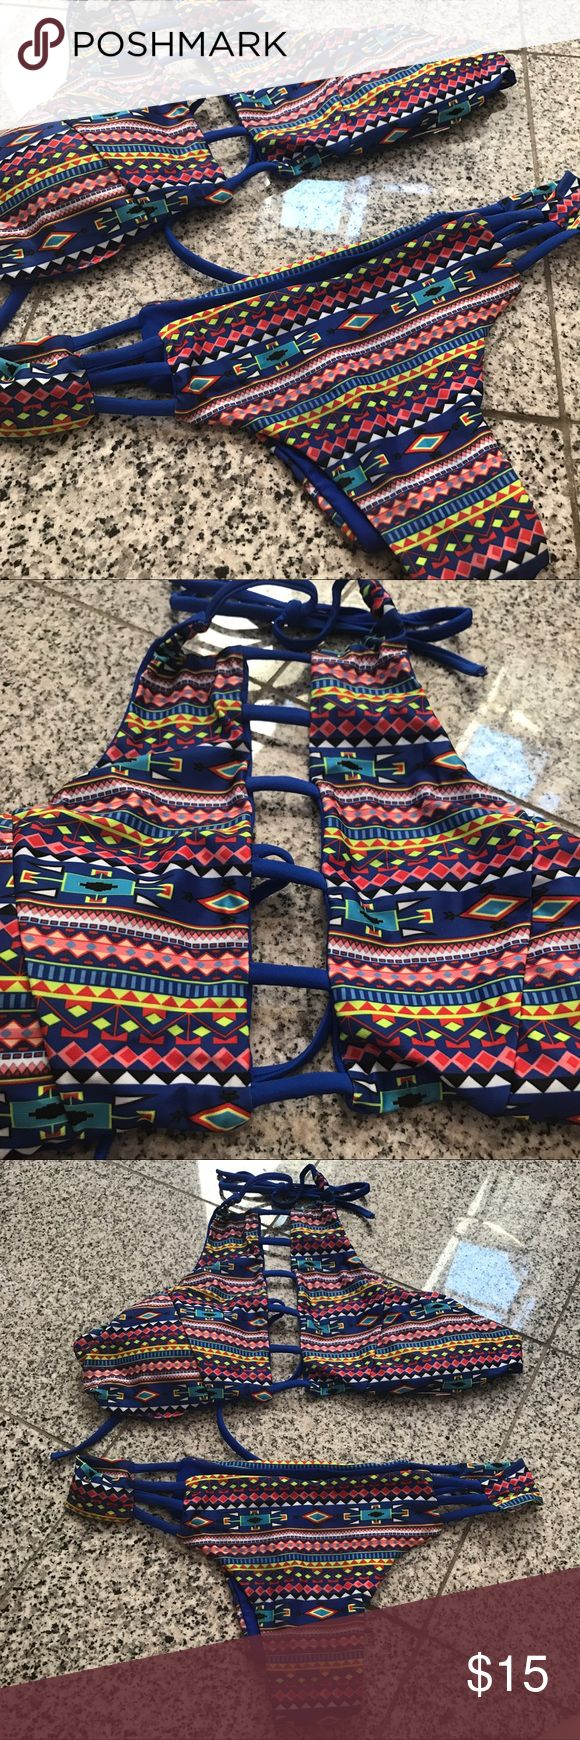 Hotapei Women's Tribal Bikini XL Hotapei Women's Tribal Bikini XL. Super cute & sexy. Very comfortable. Brand new! hotapei Swim Bikinis